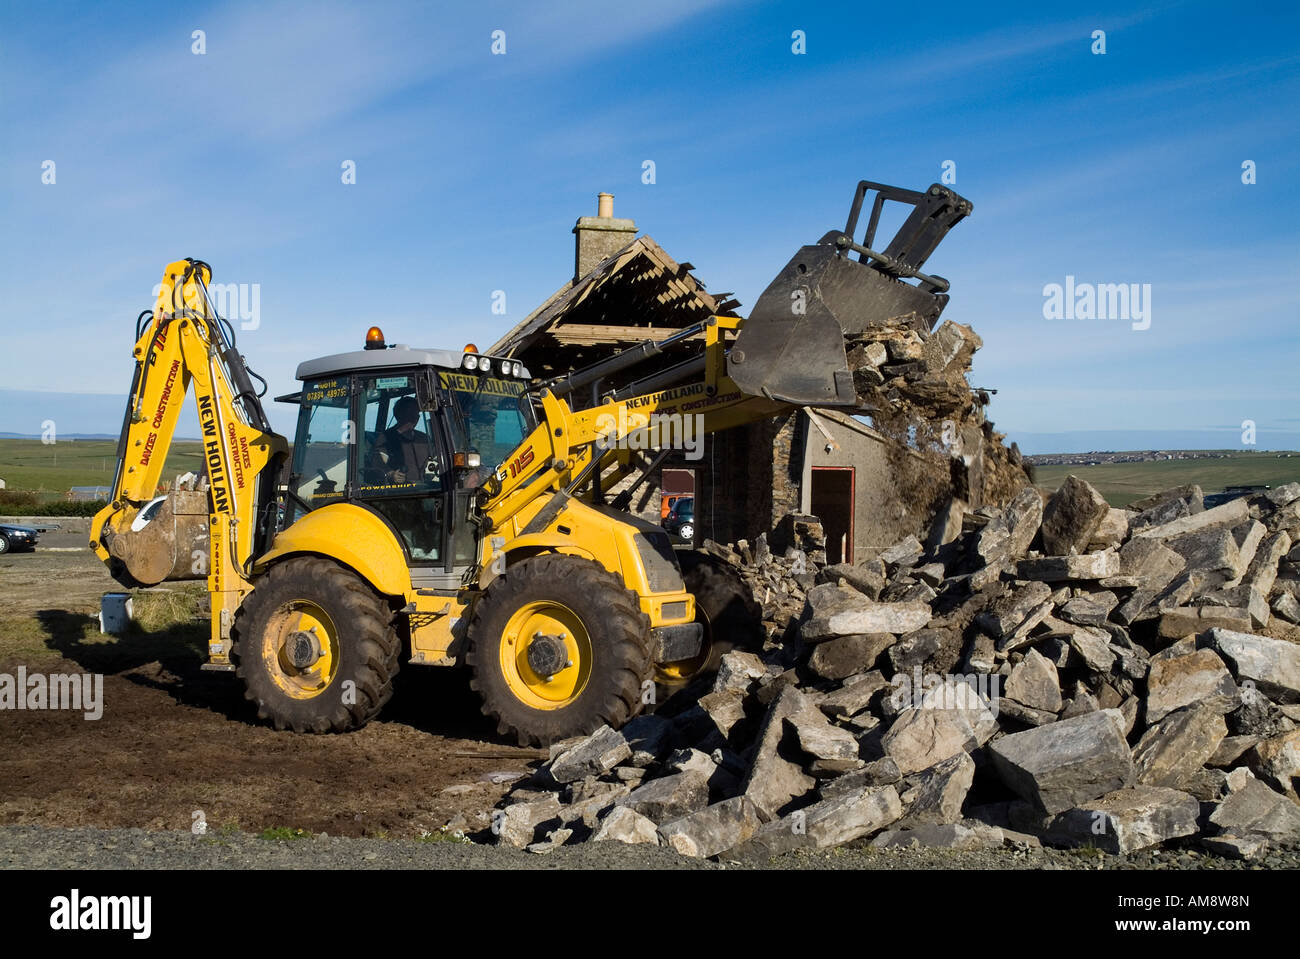 dh Demolition Digger tractor CONSTRUCTION UK Old building action clear debris demolished demolishing houses - Stock Image